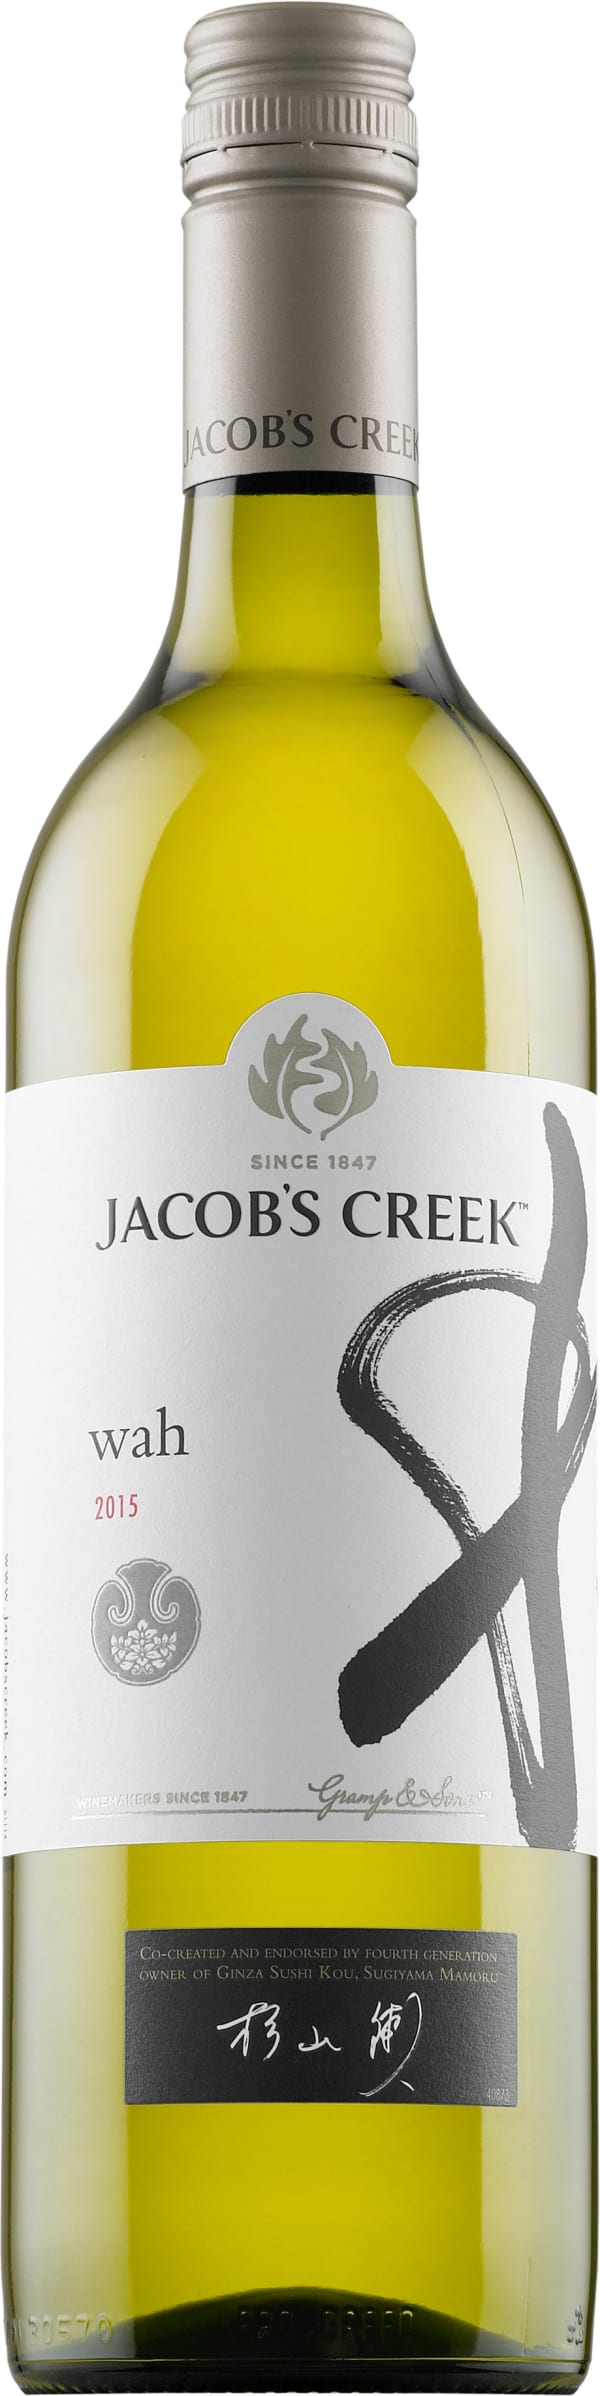 Jacob's Creek Wah 2017